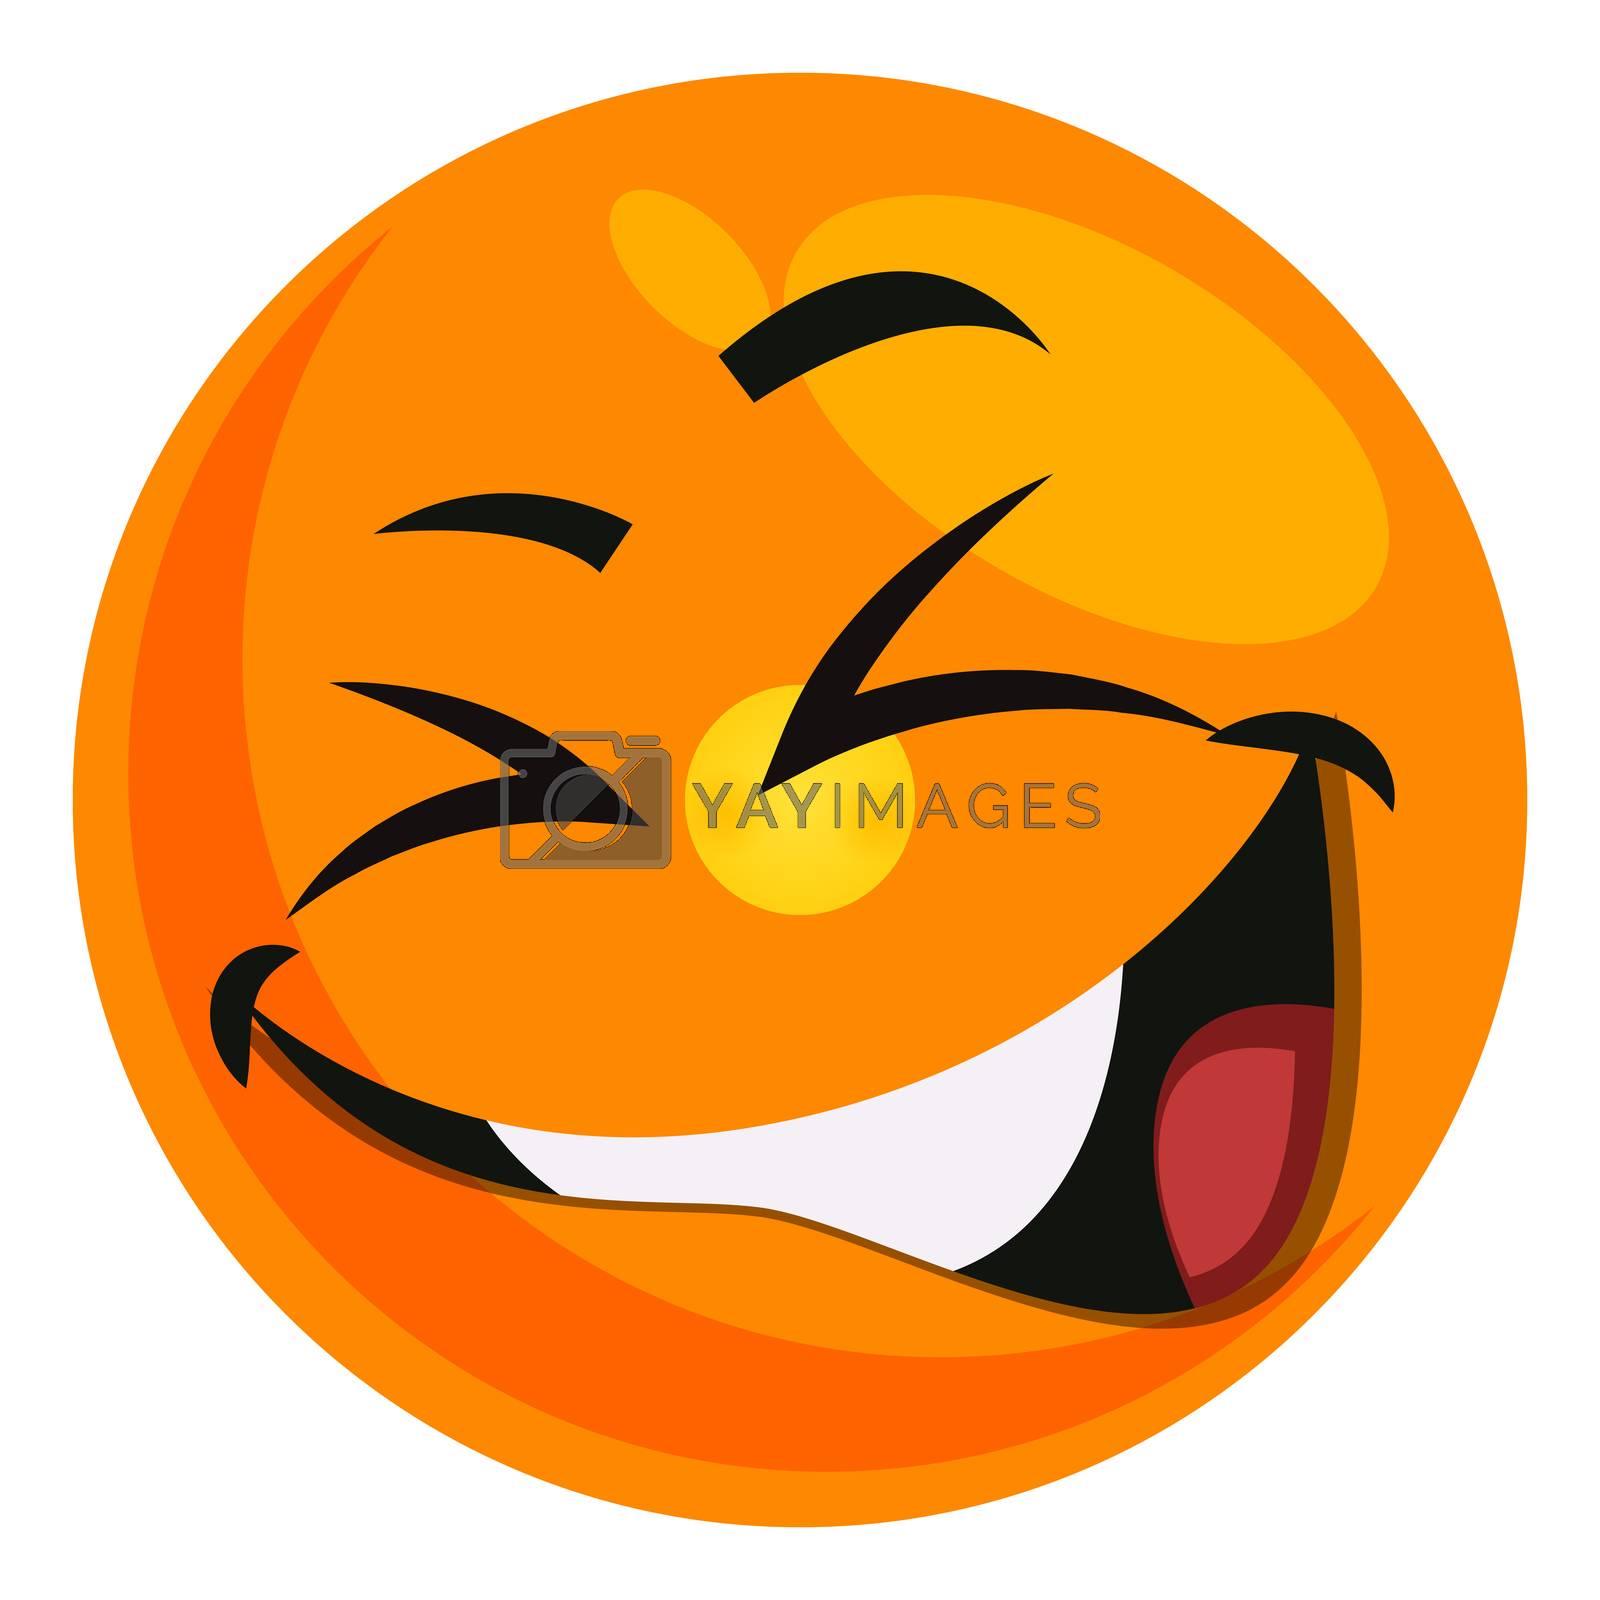 Giggling smiley, illustration, vector on white background